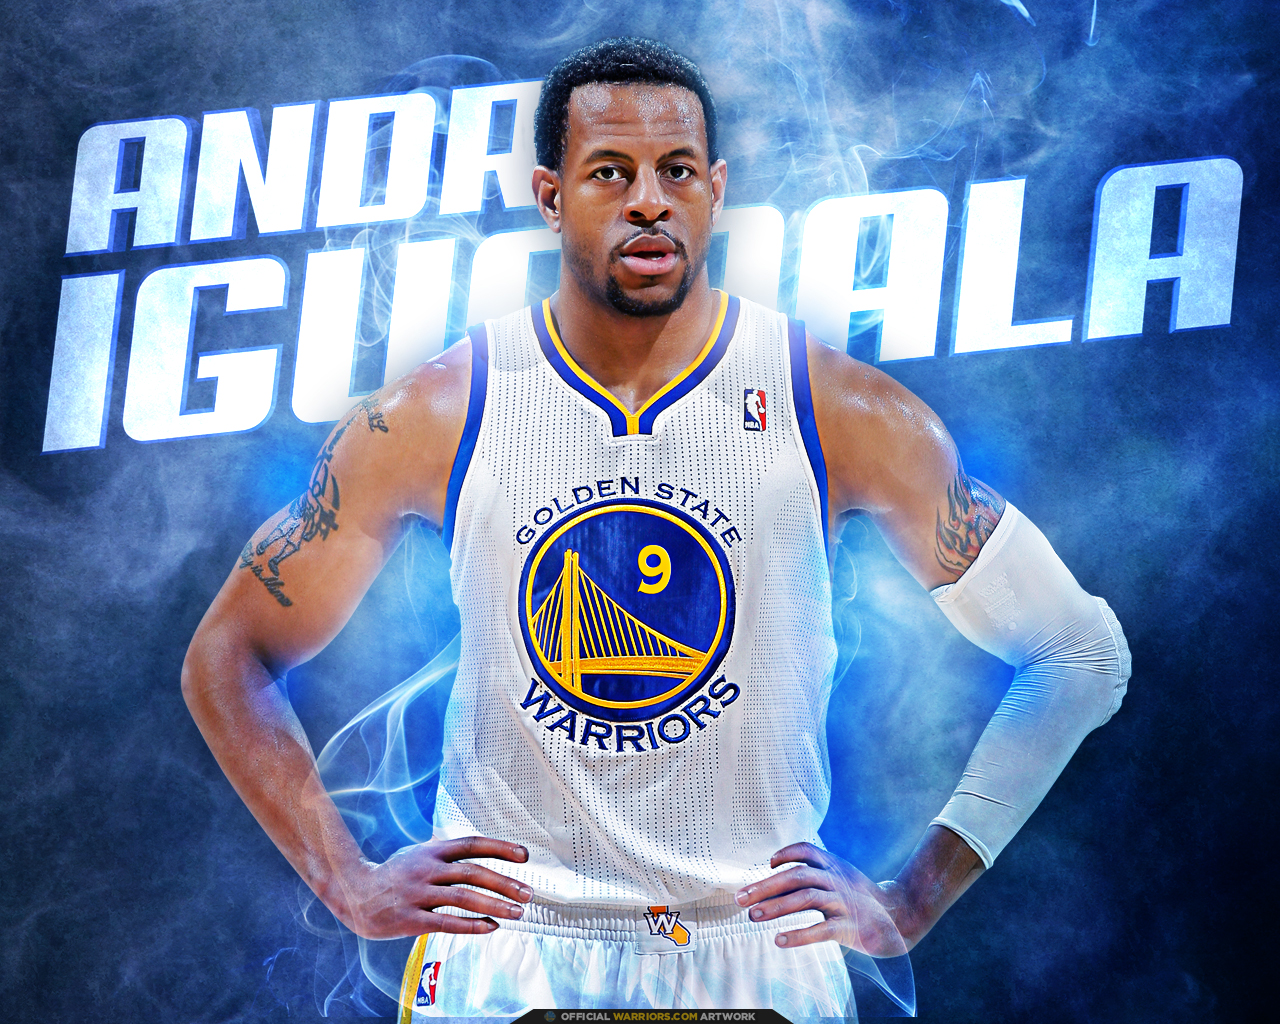 Andre Iguodala Golden State Warriors Wallpaper Streetball